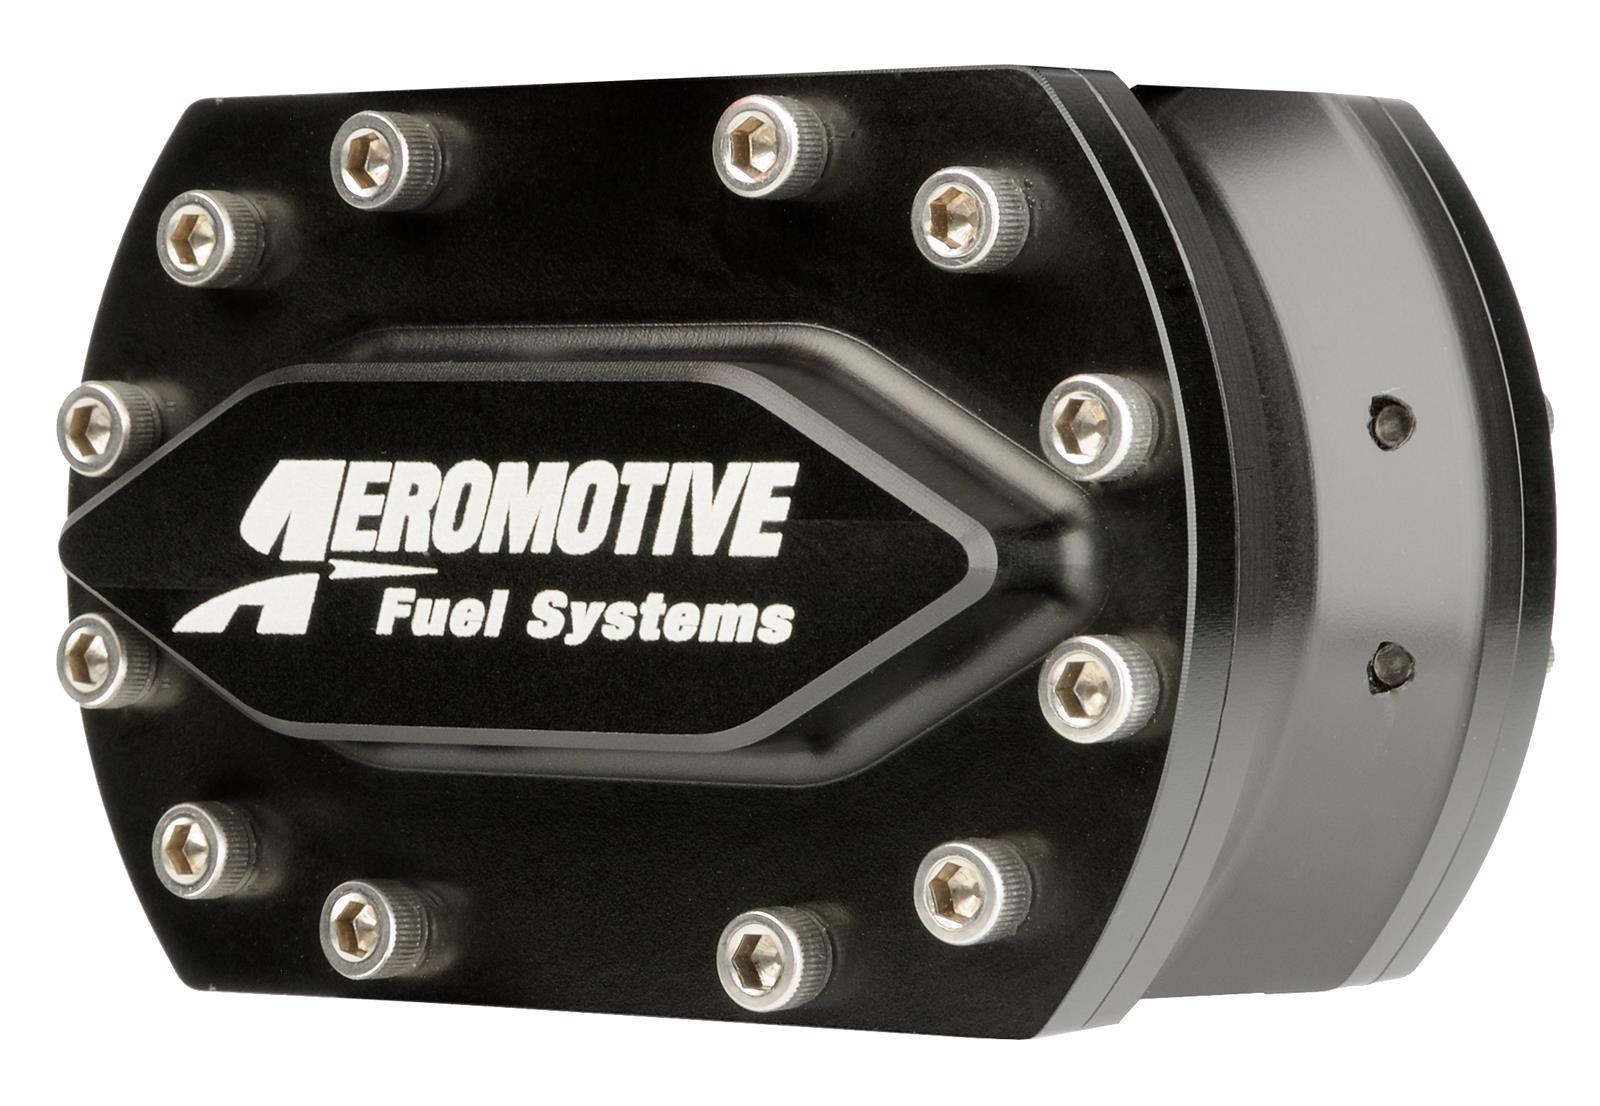 Aeromotive 11935 Fuel Pump, Hex Driven, 1260 gph, In-line, 4-Bolt Flange Inlet / Outlet, Aluminum, Black, Each